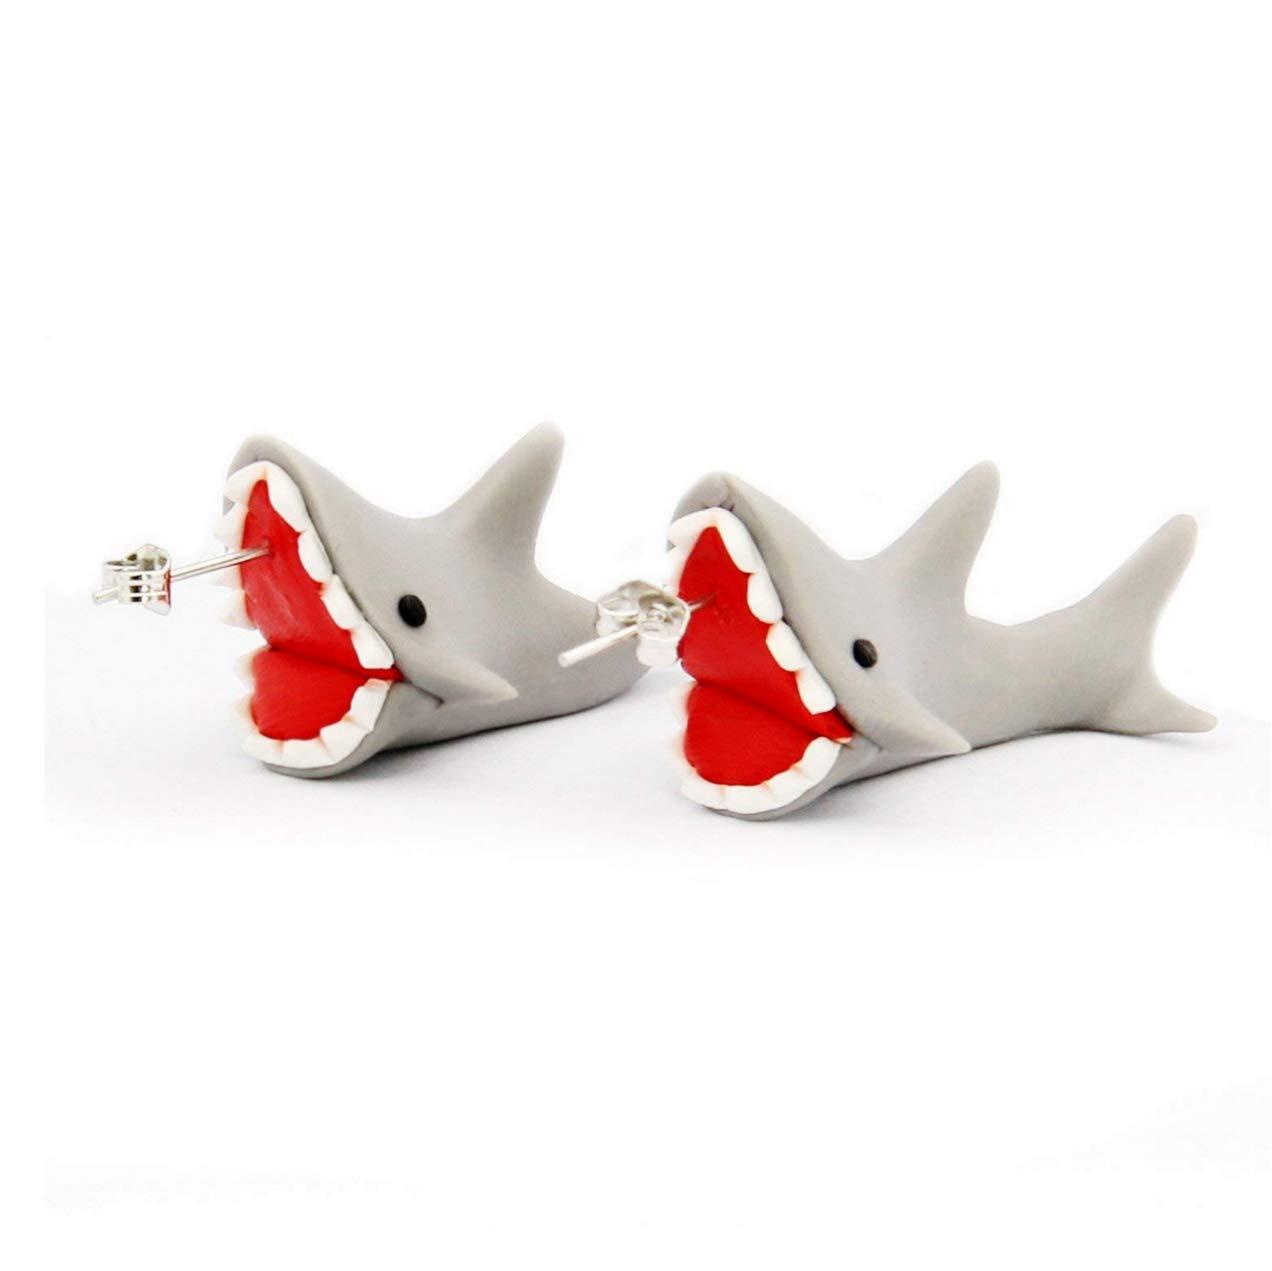 80b946843 Amazon.com: Taken Earrings Handcraft Polymer Clay Cute Shark Biting Ears  Stud Color Grey (One pair)